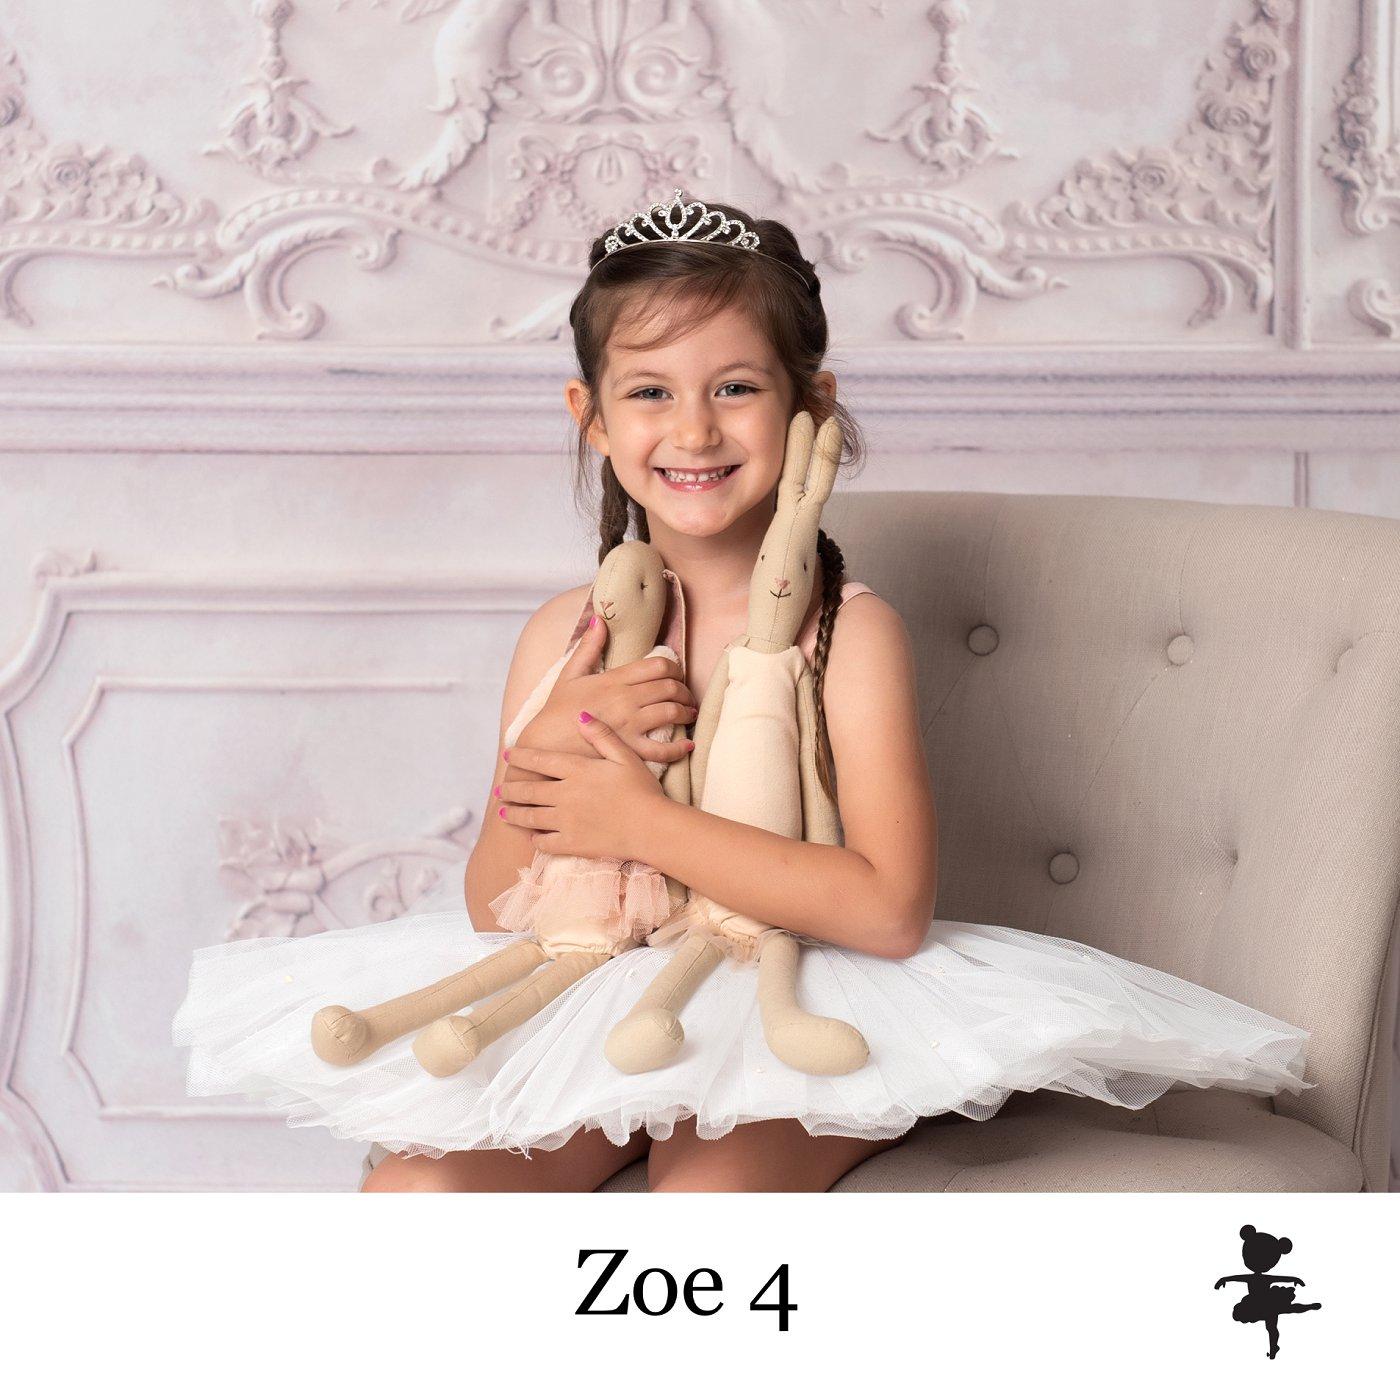 LB1219-Zoe 4.jpg